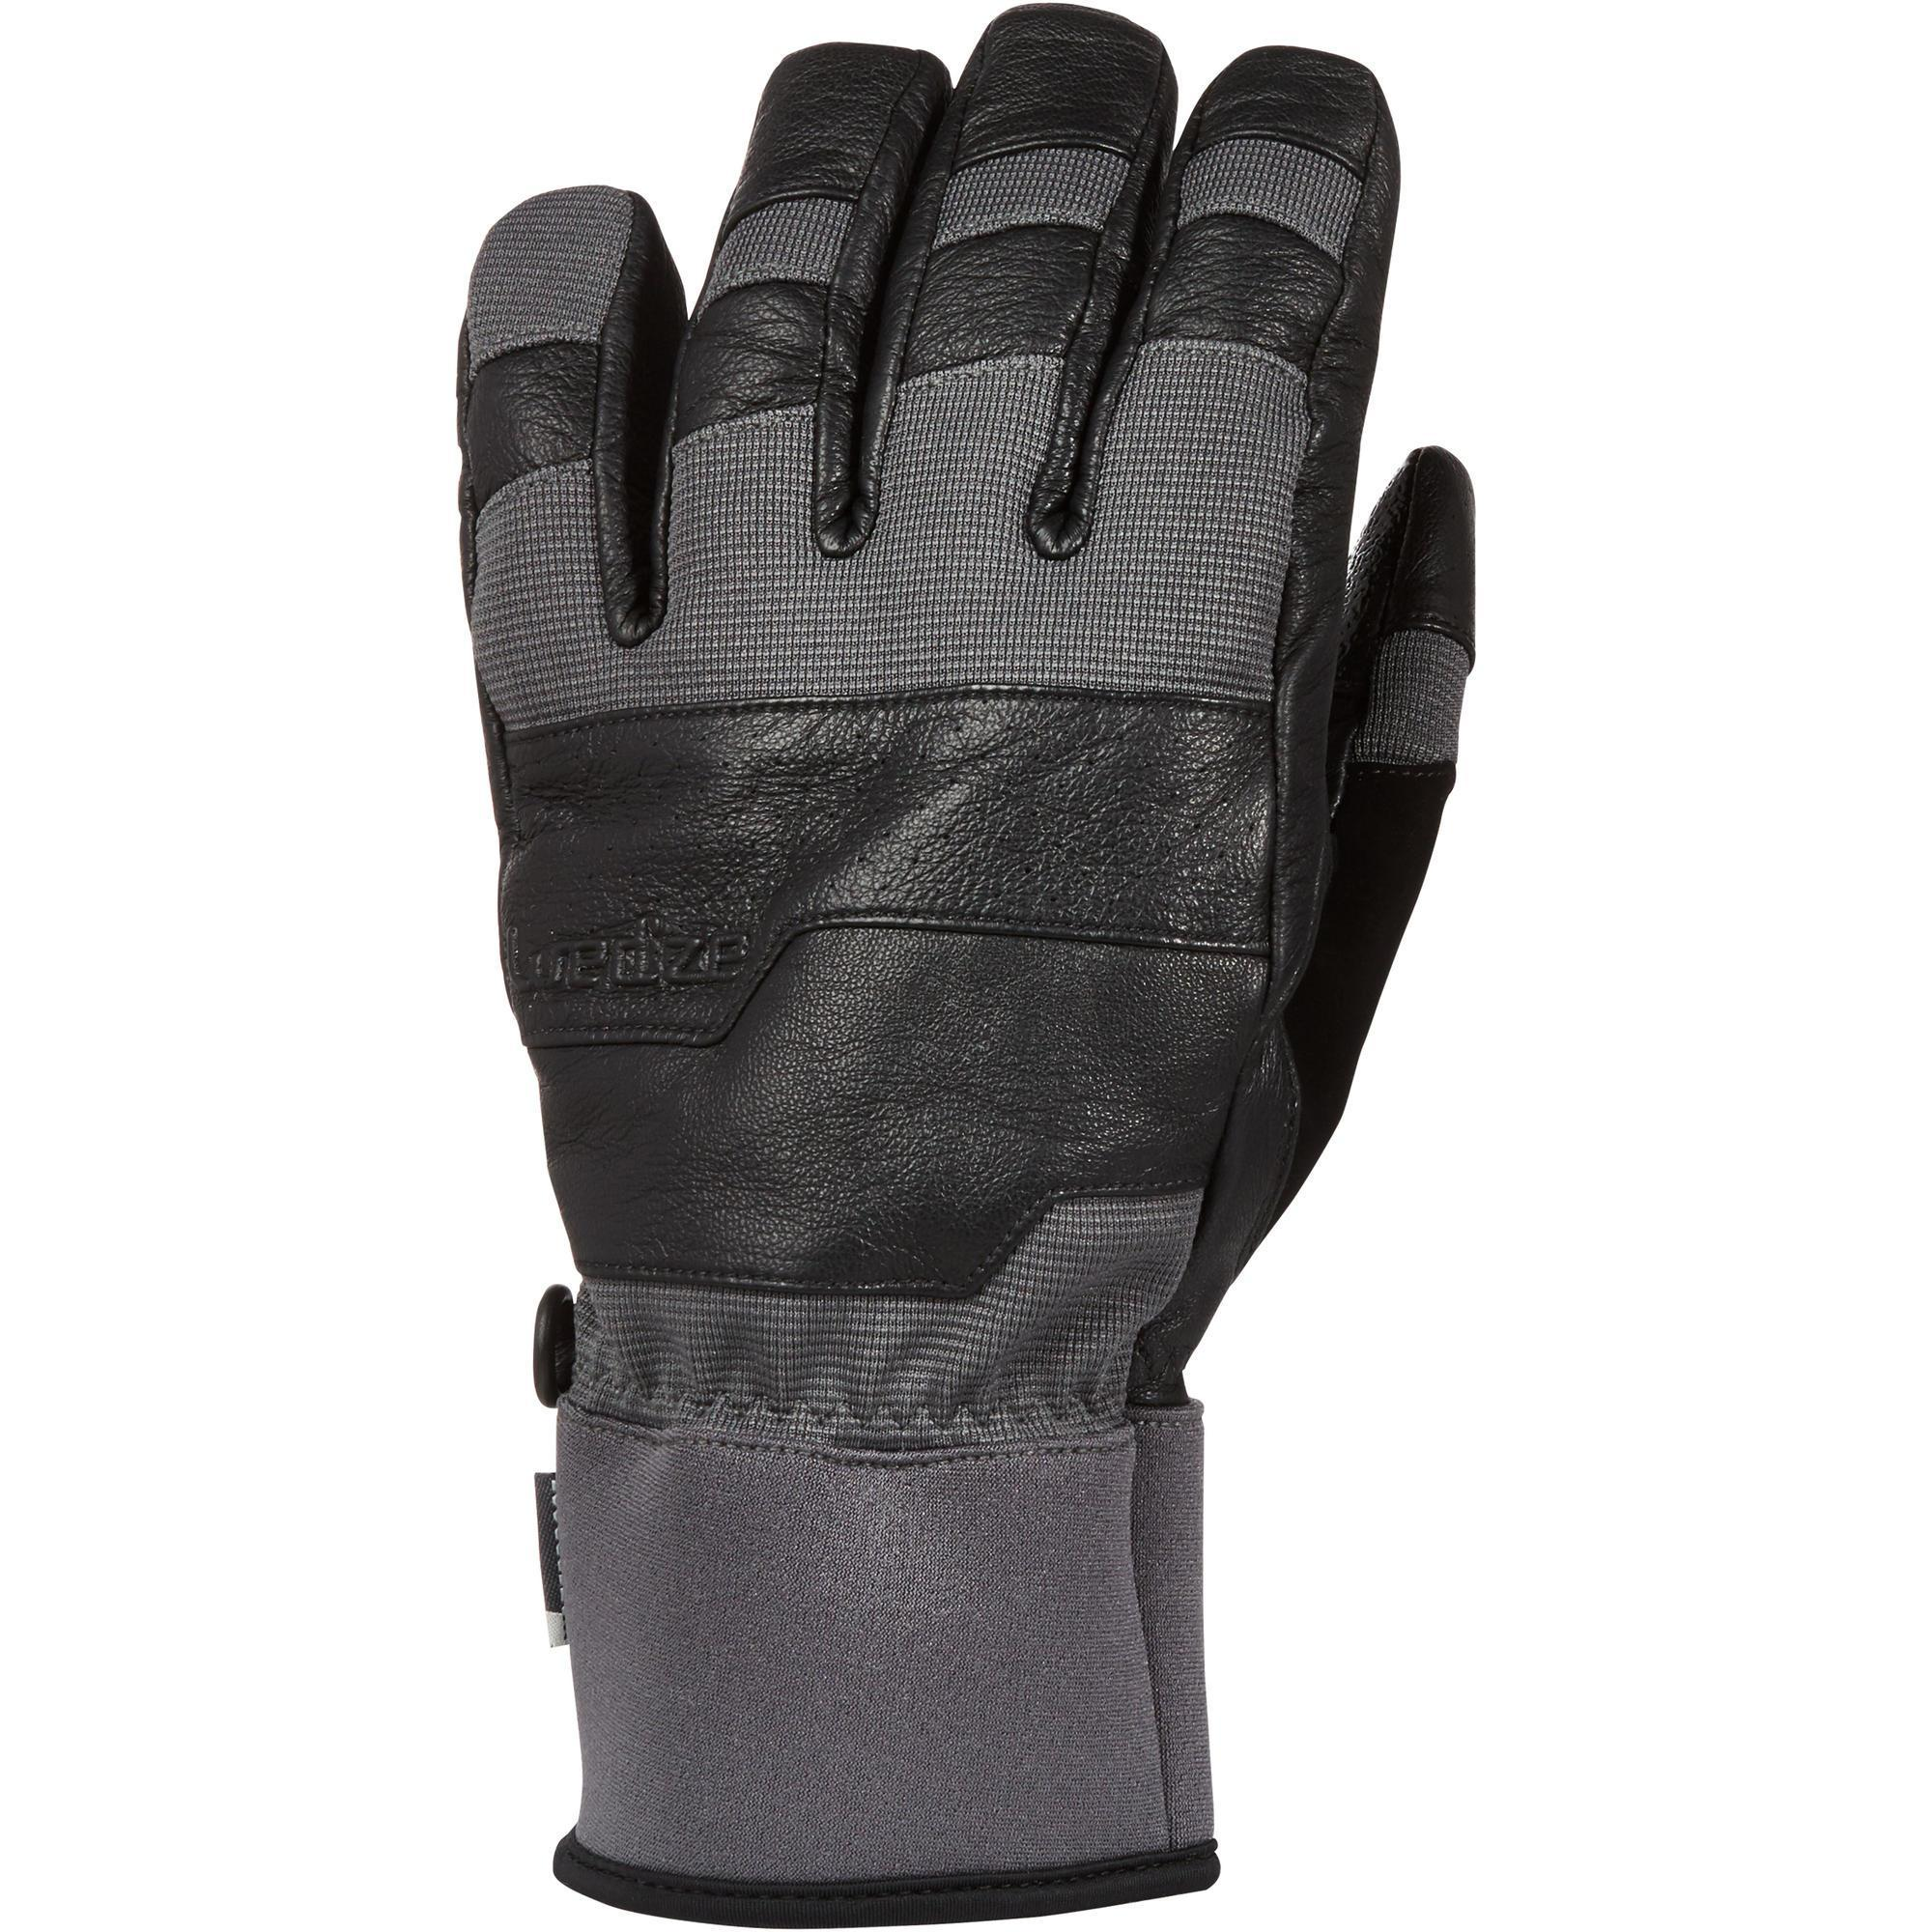 Handschuhe Snowboard/Ski 900 Erwachsene | Accessoires > Handschuhe > Sonstige Handschuhe | Wedze